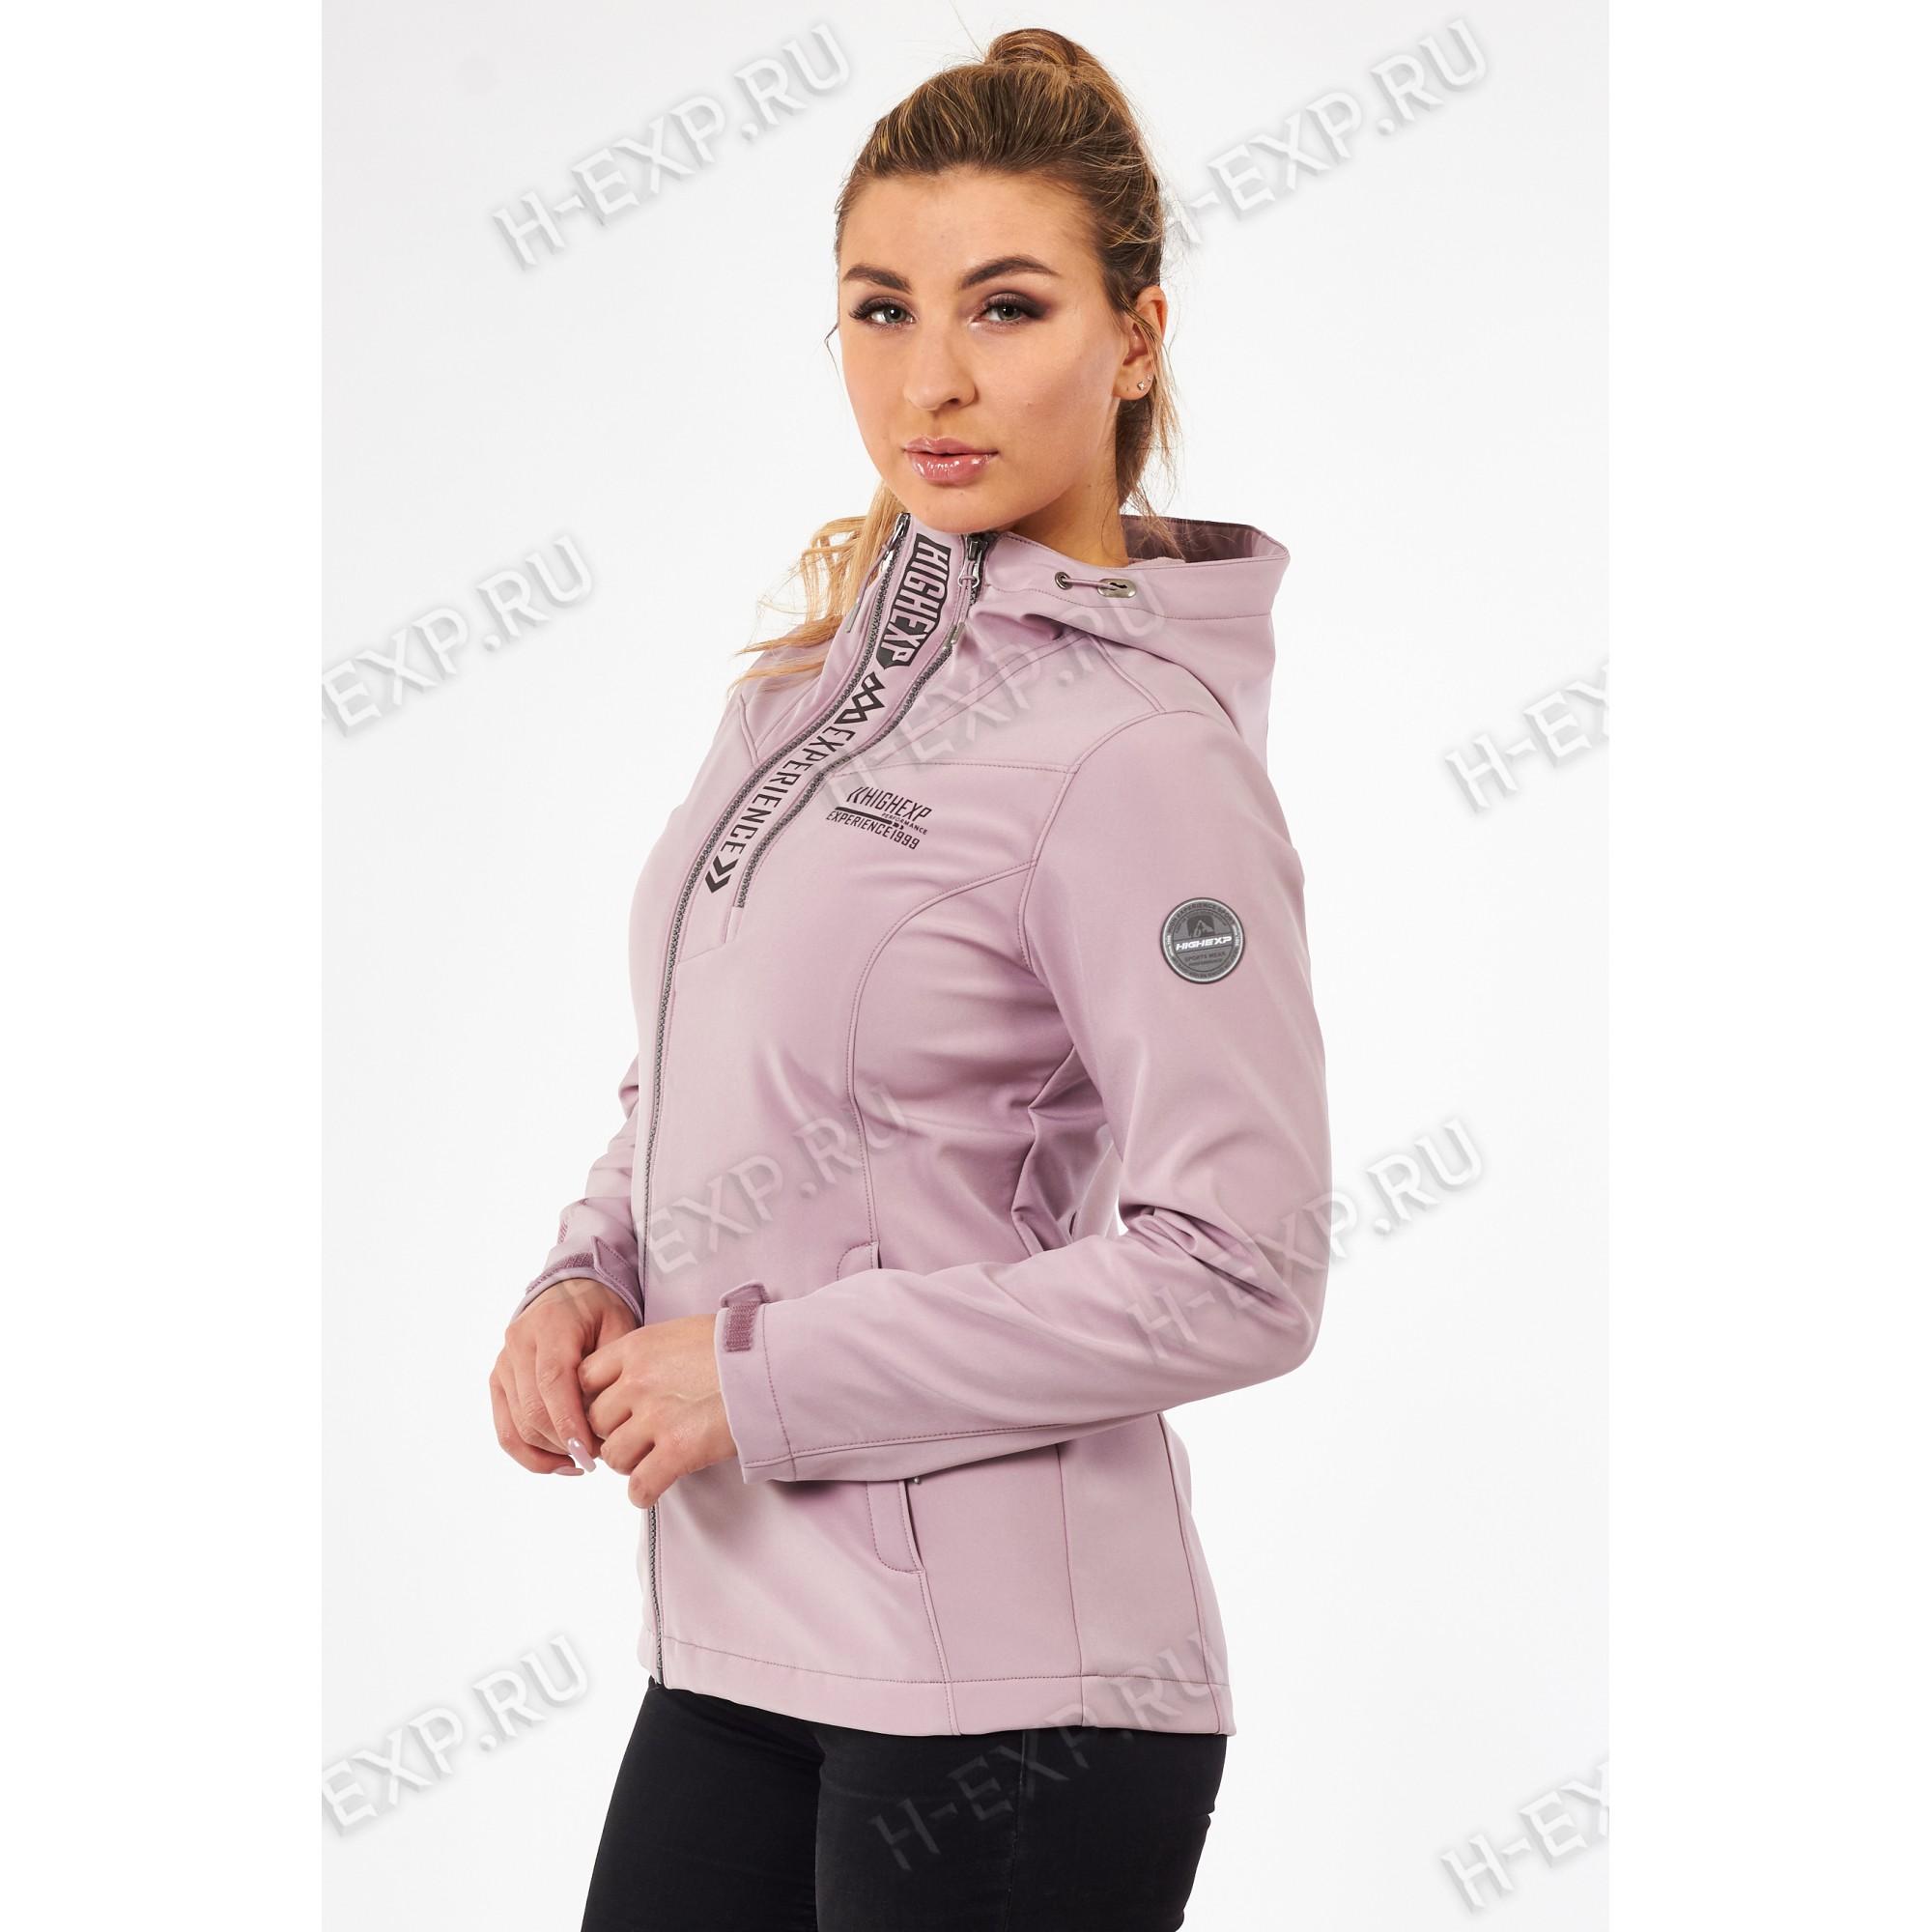 Куртка-виндстоппер весна-осень женская High Experience 11658 (4058) Пудра